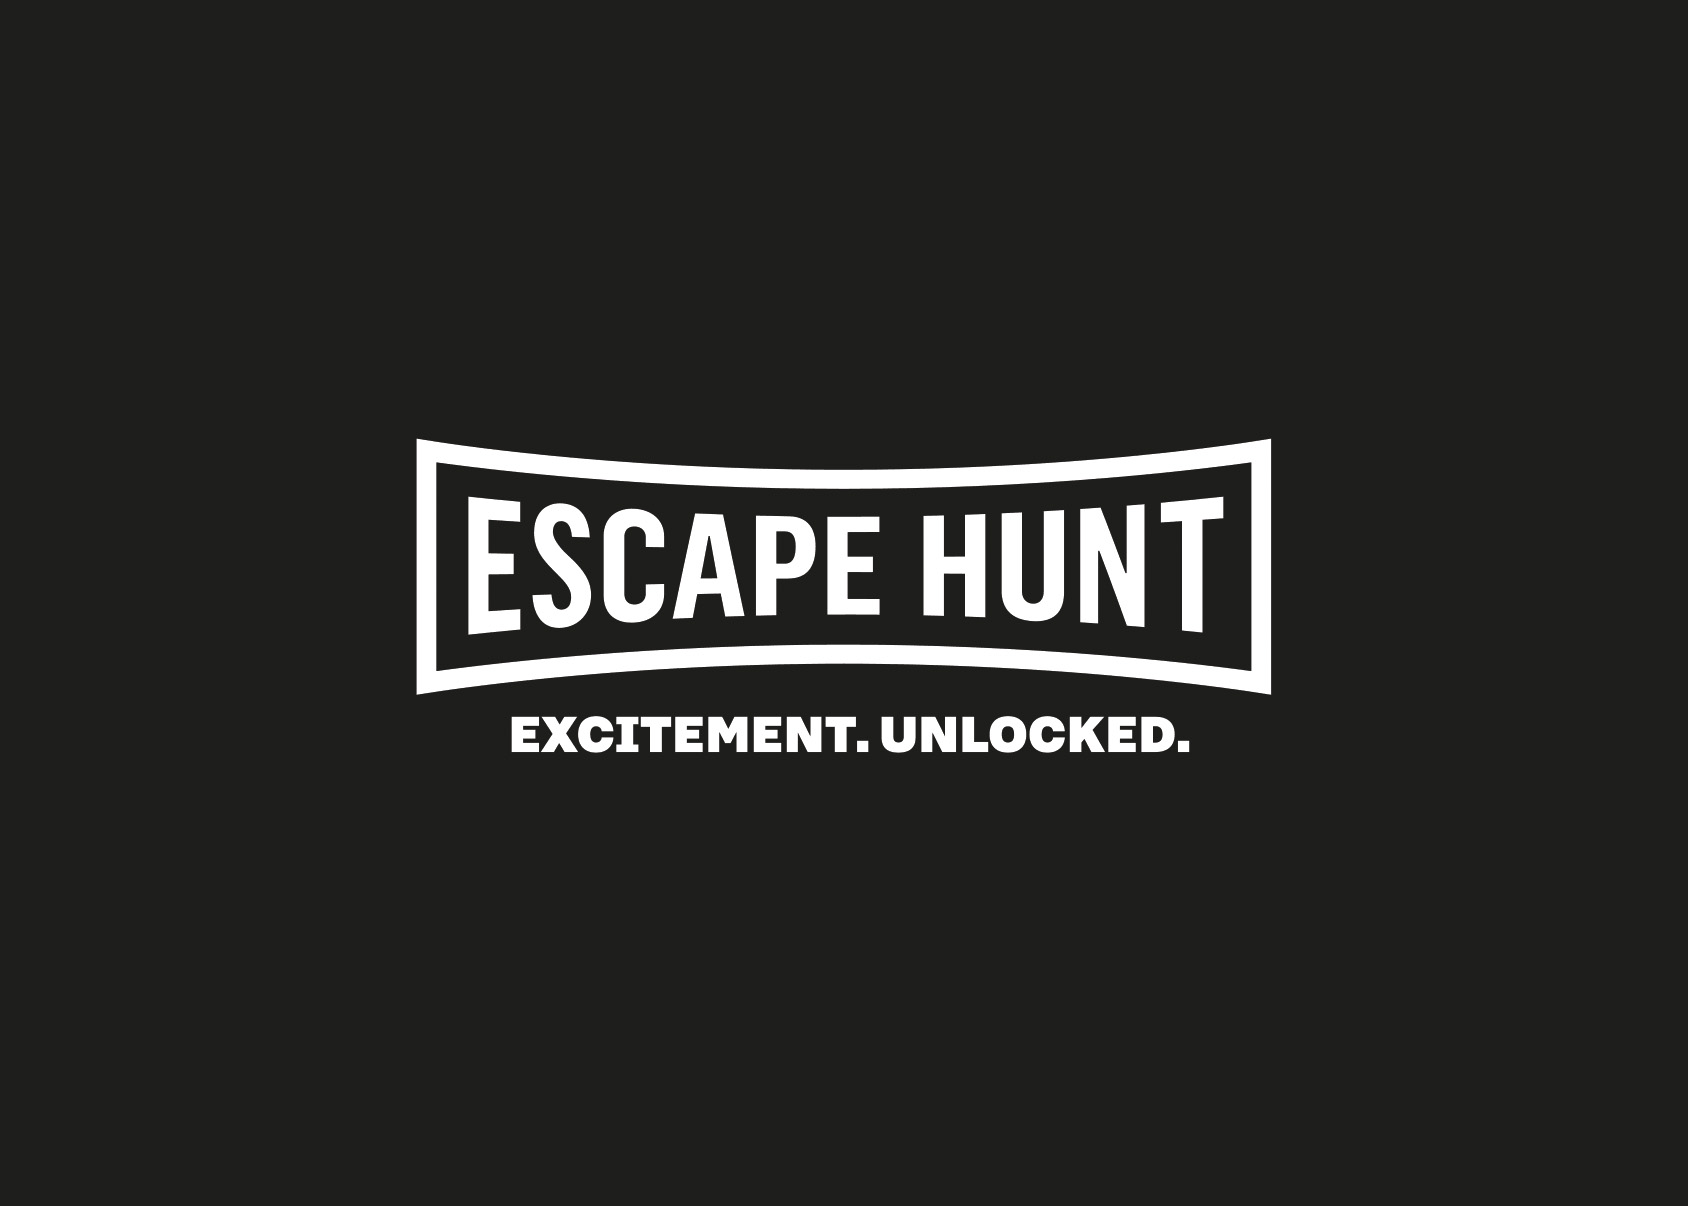 escape hunt black branding